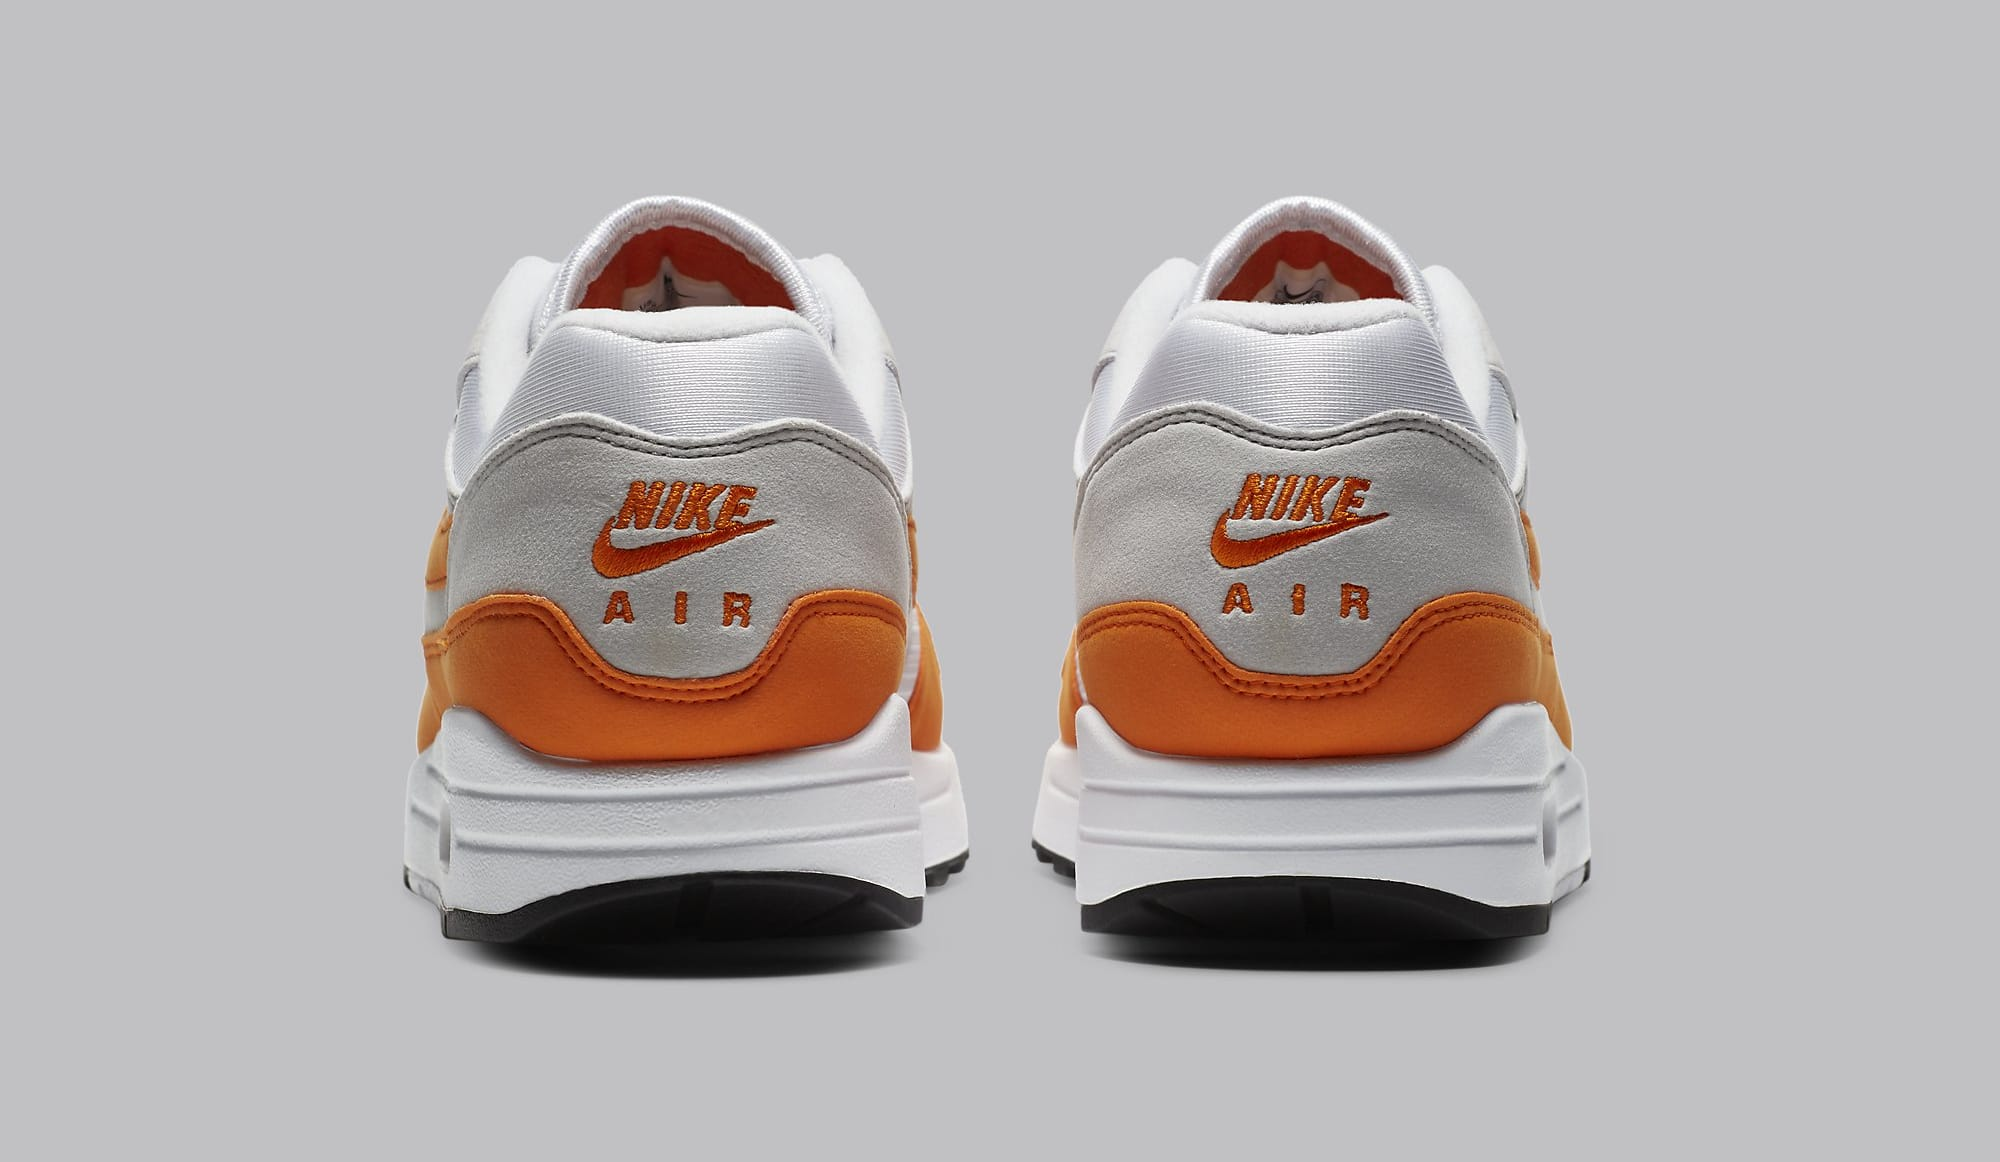 Nike Air Max 1 'Magma Orange' DC1454-101 Heel